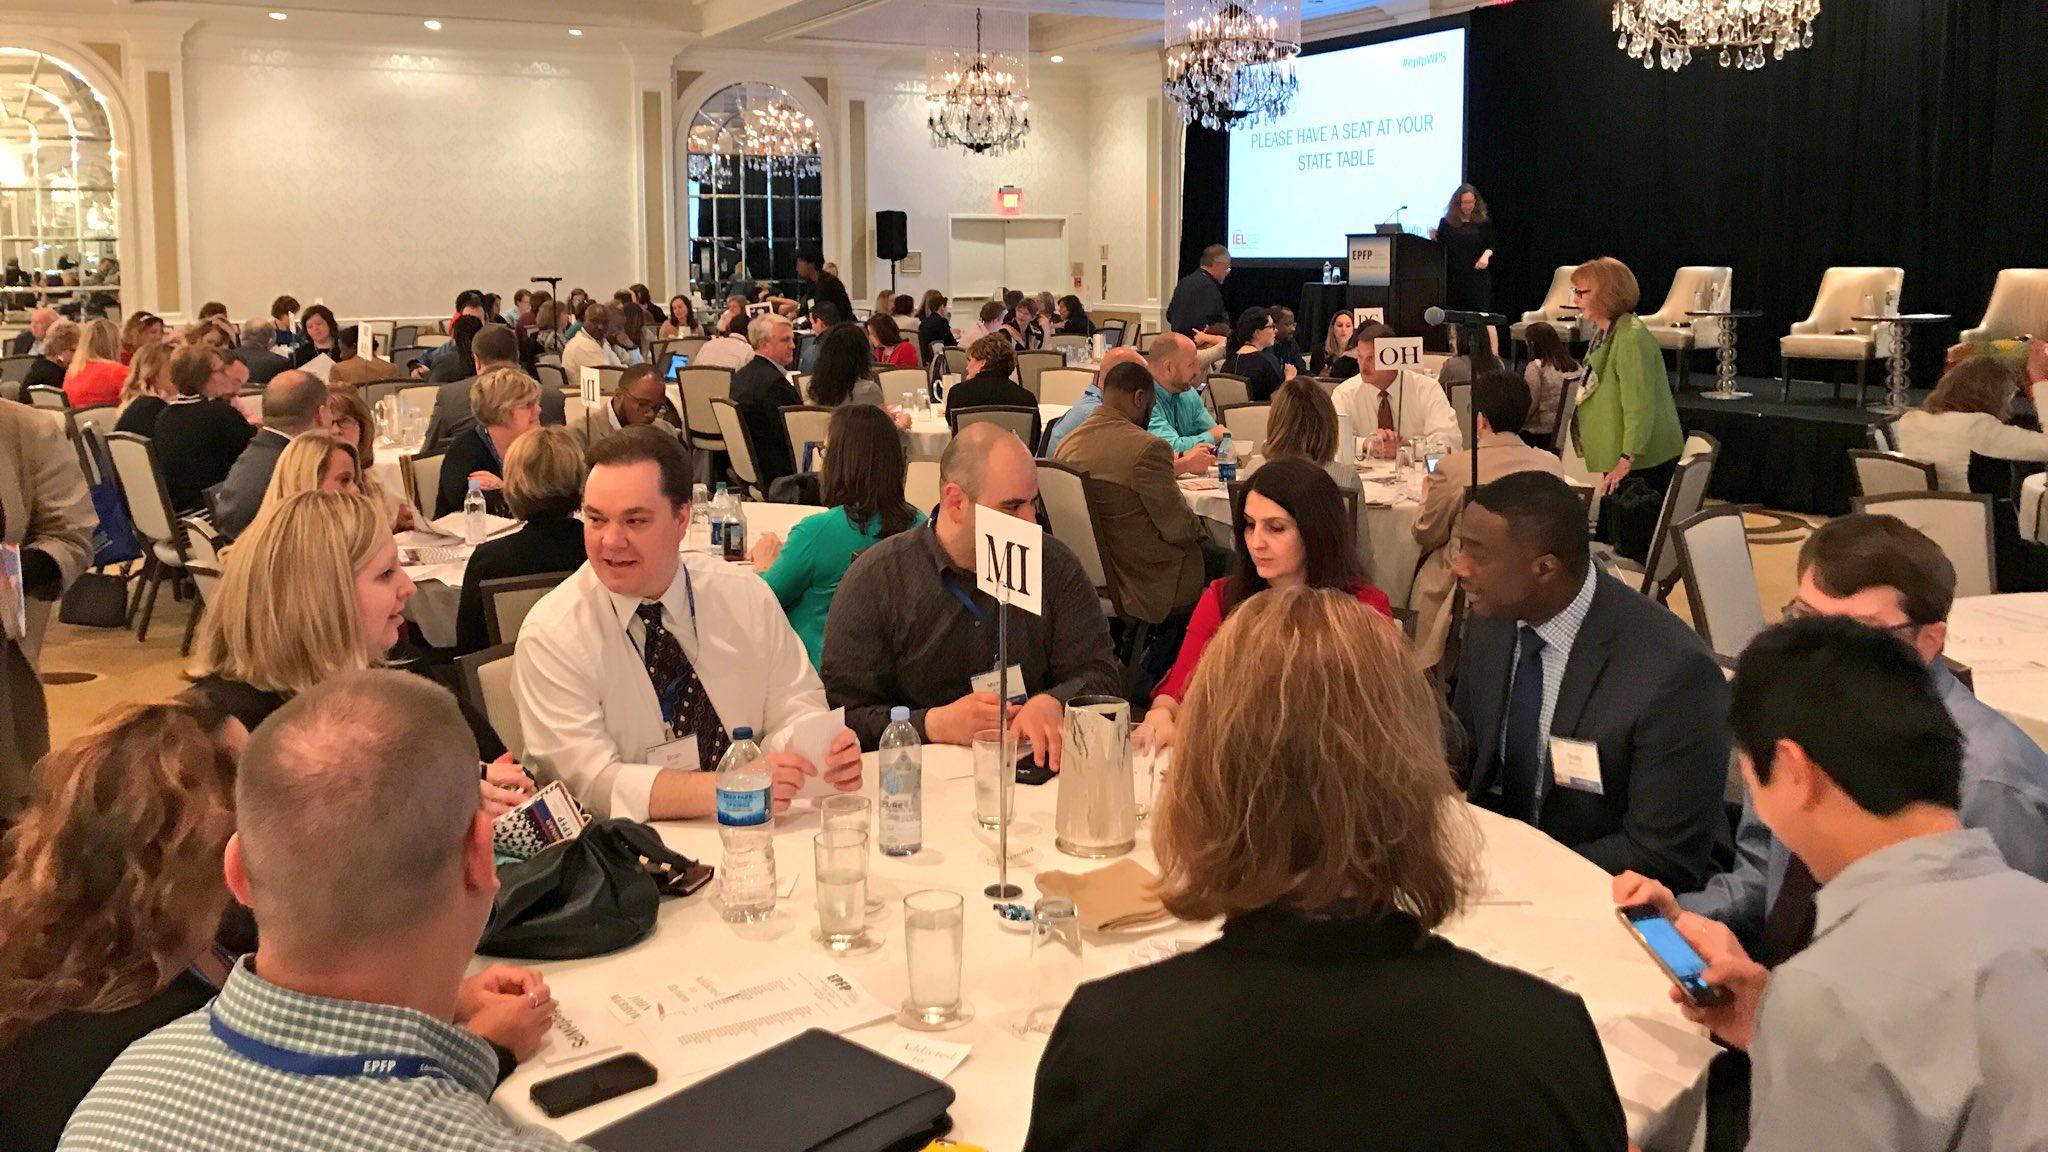 Getting started at Washington Policy Seminar w 16 states inc. MA @epfp_iel #epfpwps https://t.co/bP7RE9EQ5N